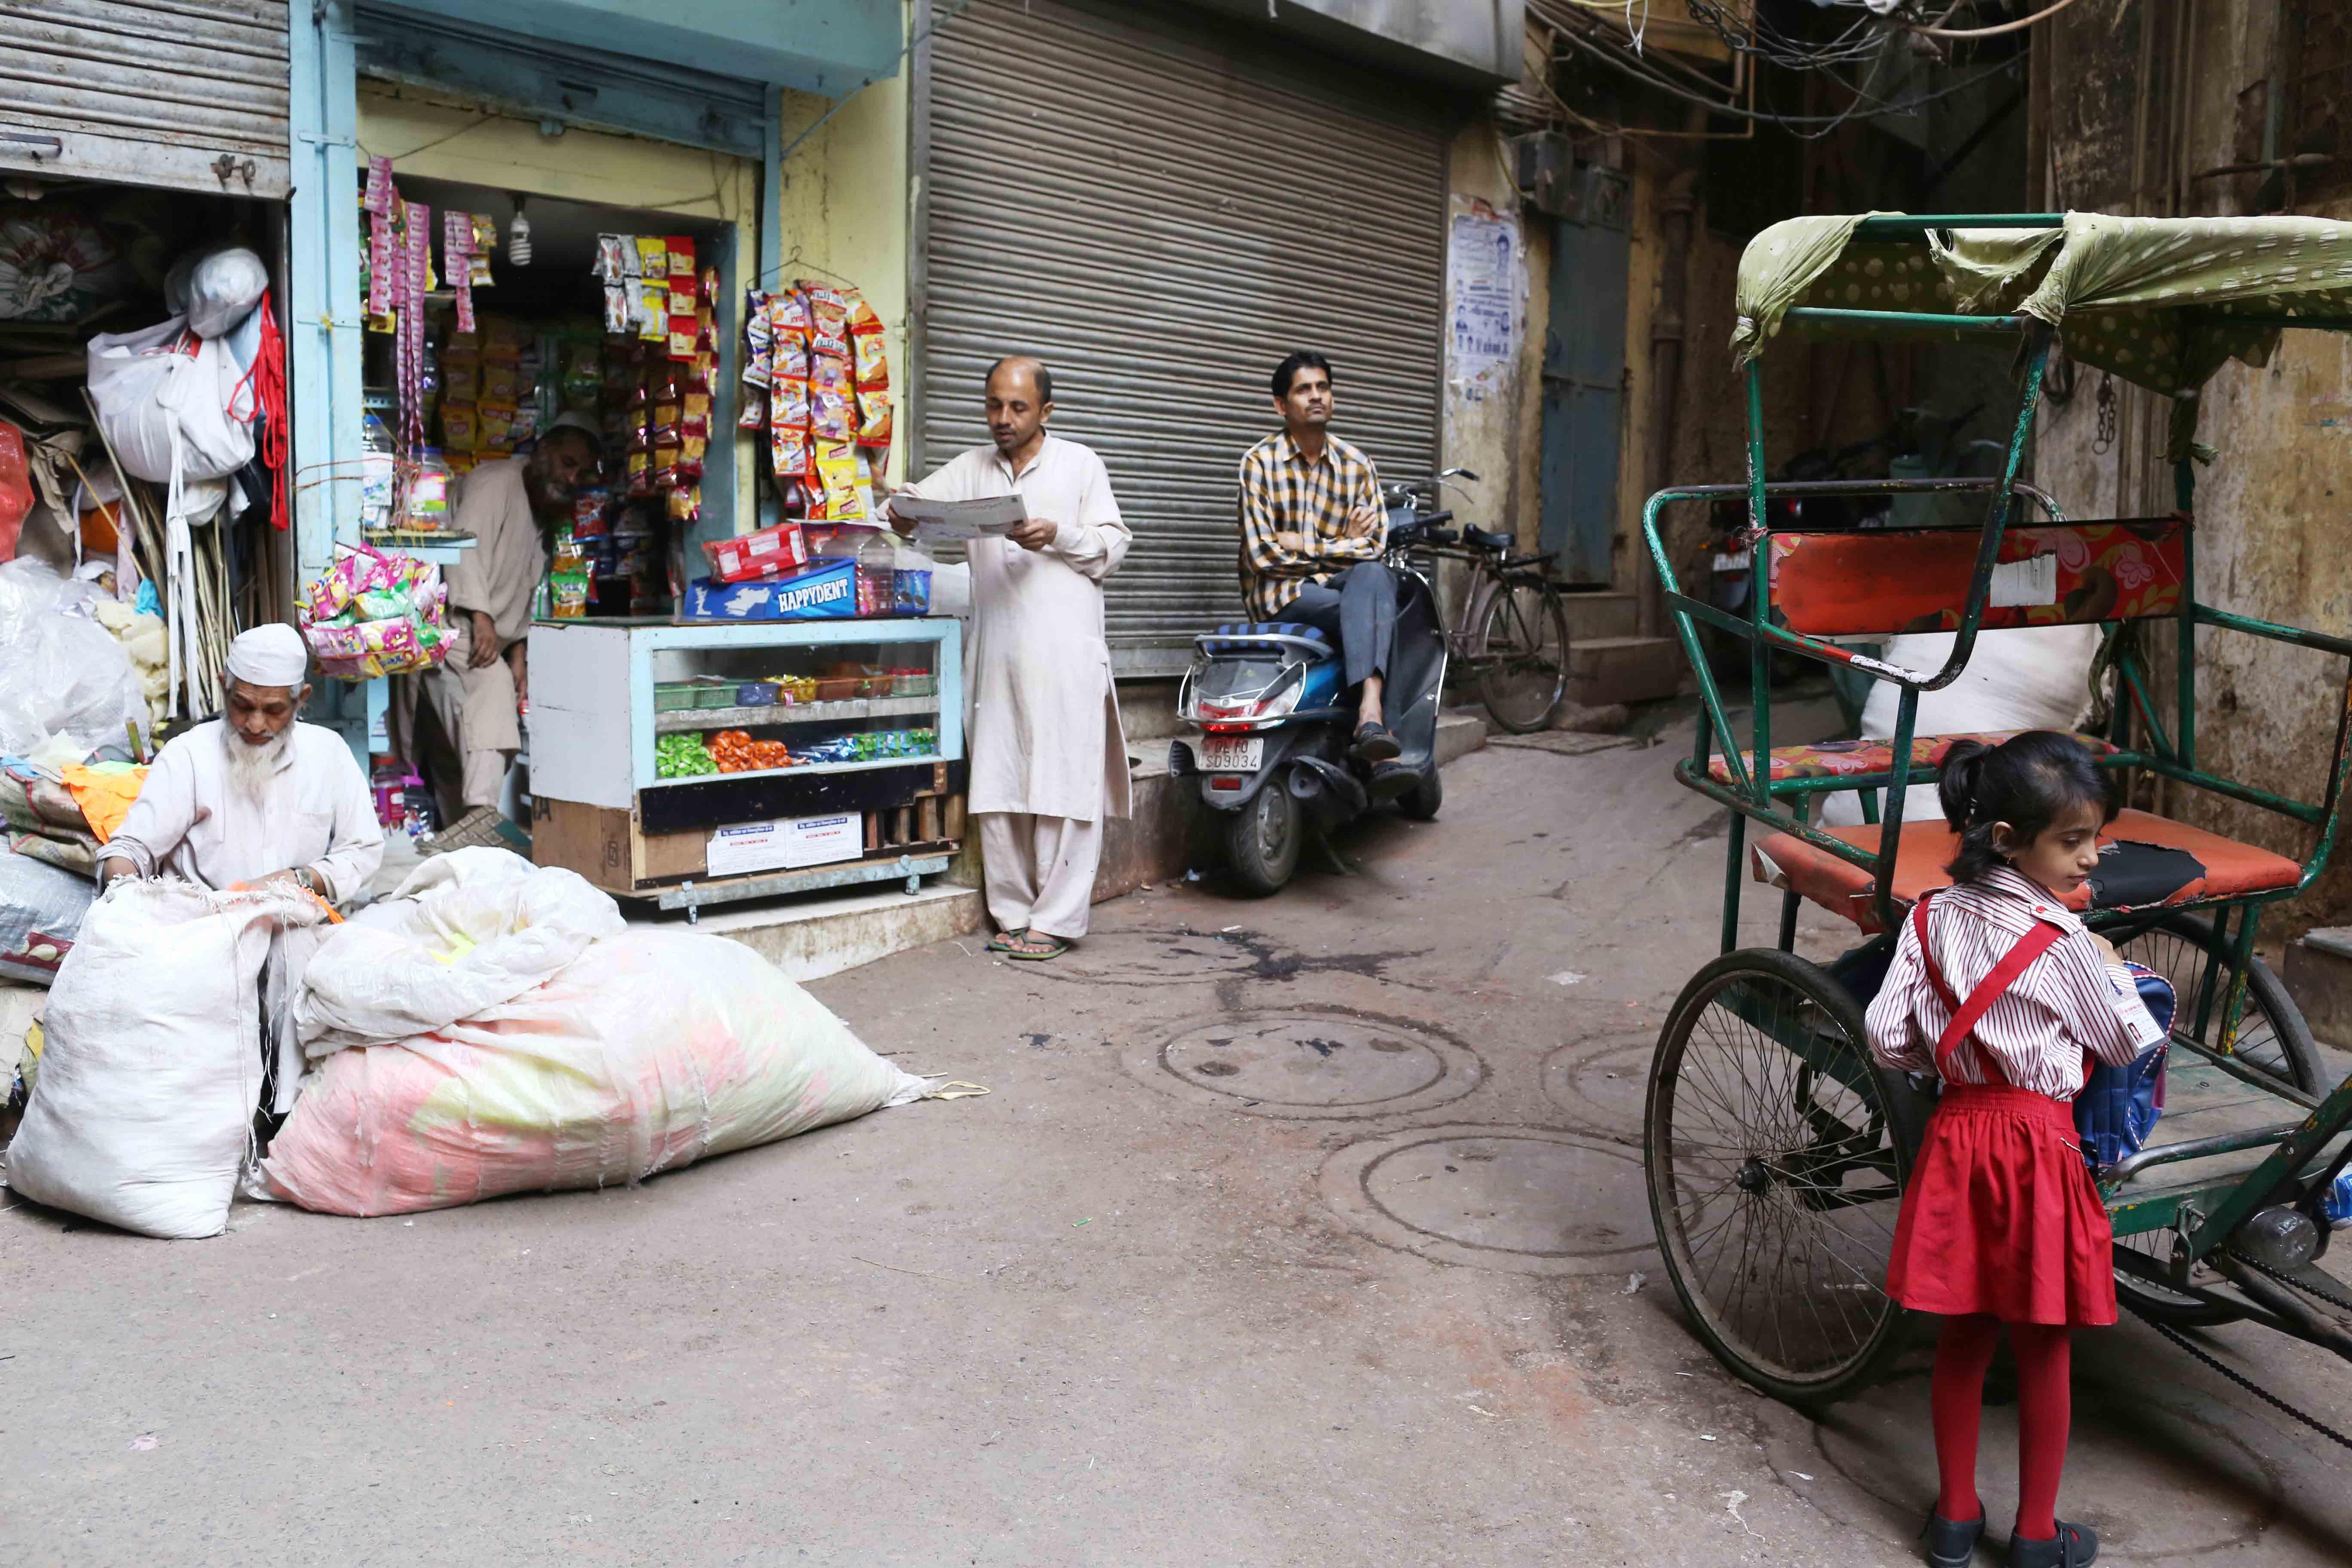 City Hangout - Razia Sultan's Neighborhood, Bulbuli Khana